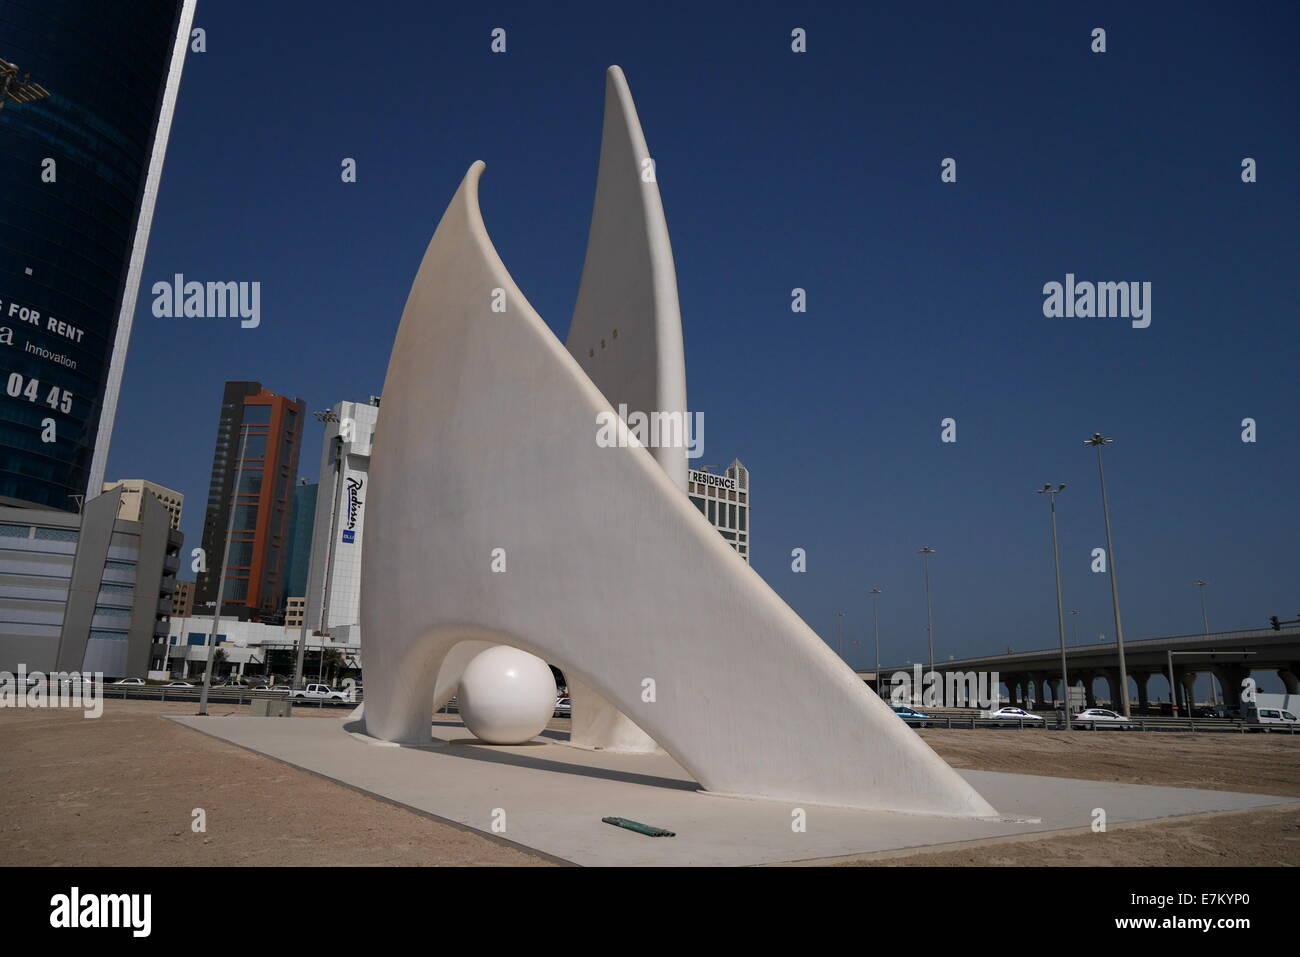 The Sail Monument, Manama, Kingdom of Bahrain - Stock Image